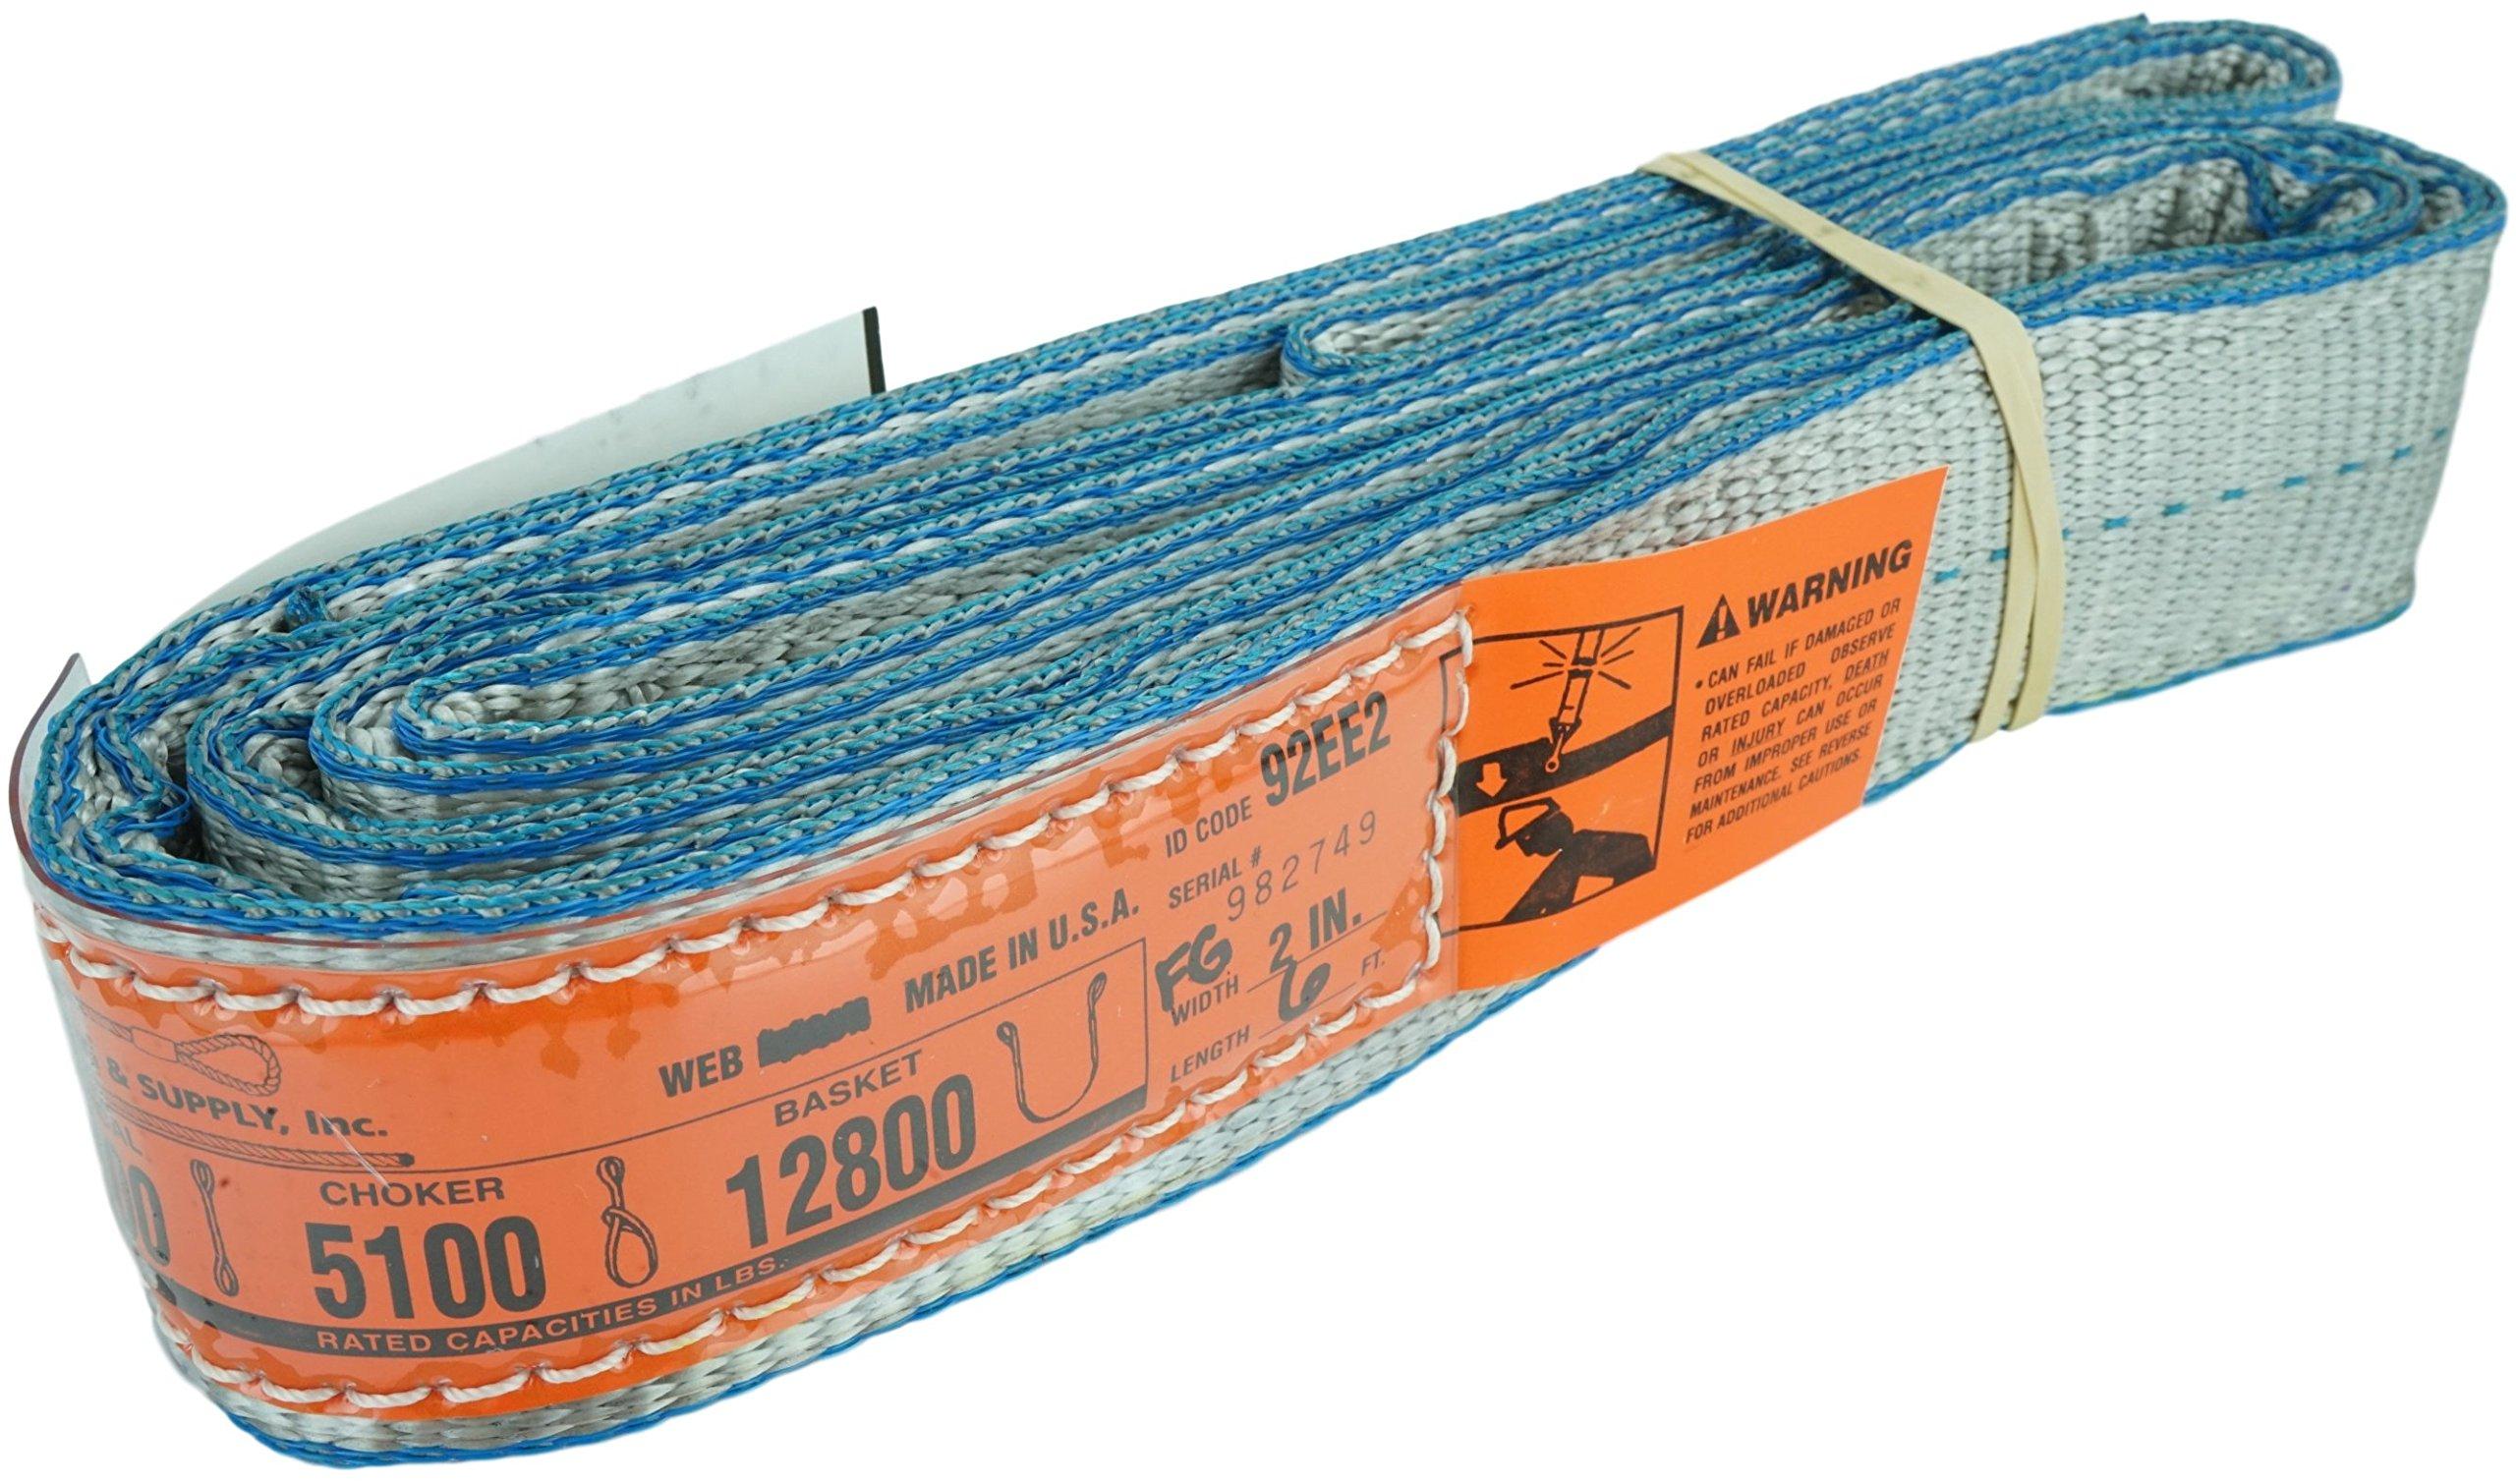 DD Sling (USA Made). 2'' x 10', Flo Guard 2 Ply, Polyester Lifting Slings, Eye & Eye, Heavy Duty, 6400 lbs Vertical, 5100 Choker, 12800 Basket Load Capacity (2'' x 10')